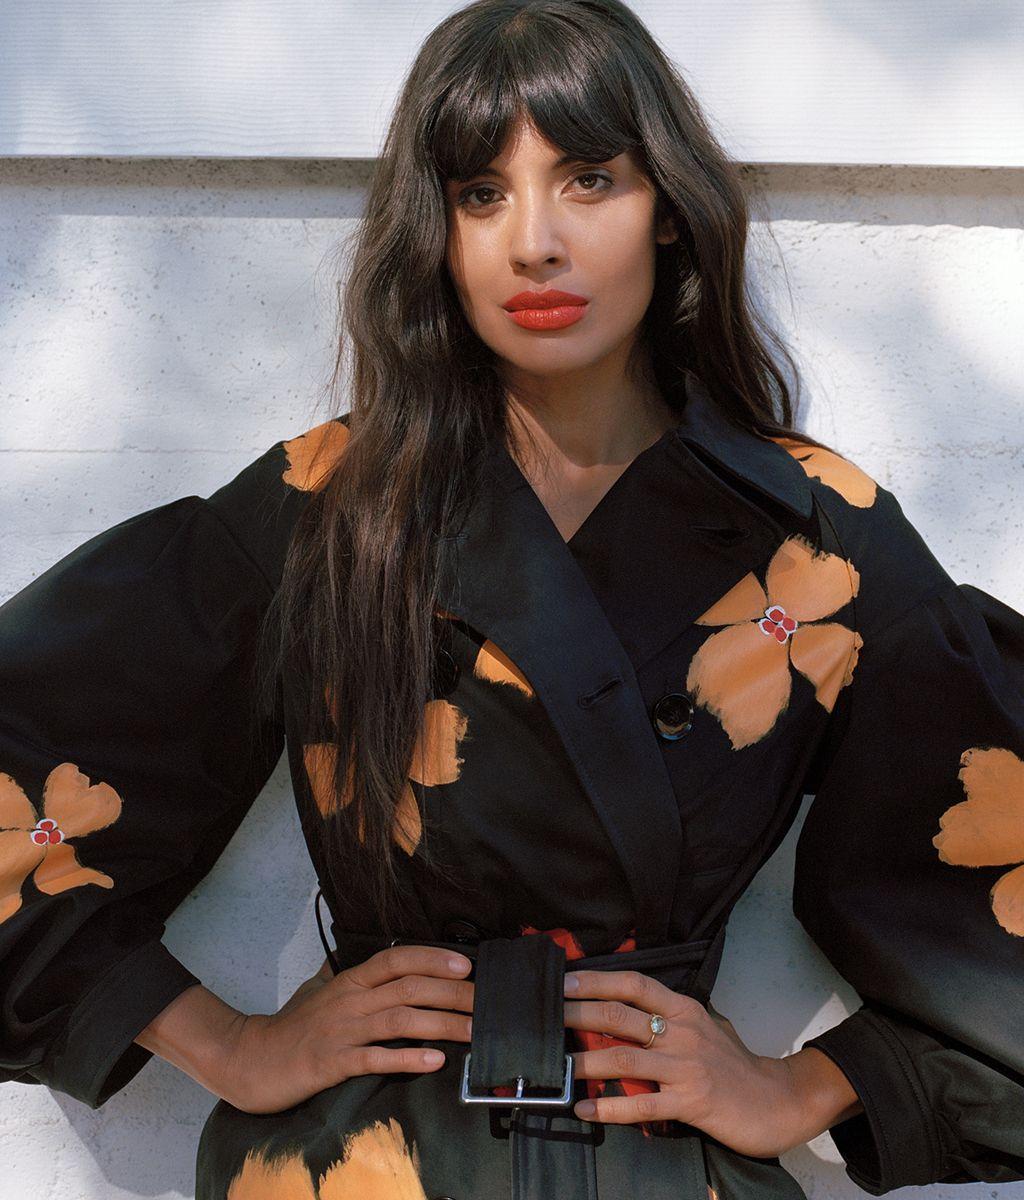 H Jameela Jamil μίλησε για τα φίλτρα στα social media